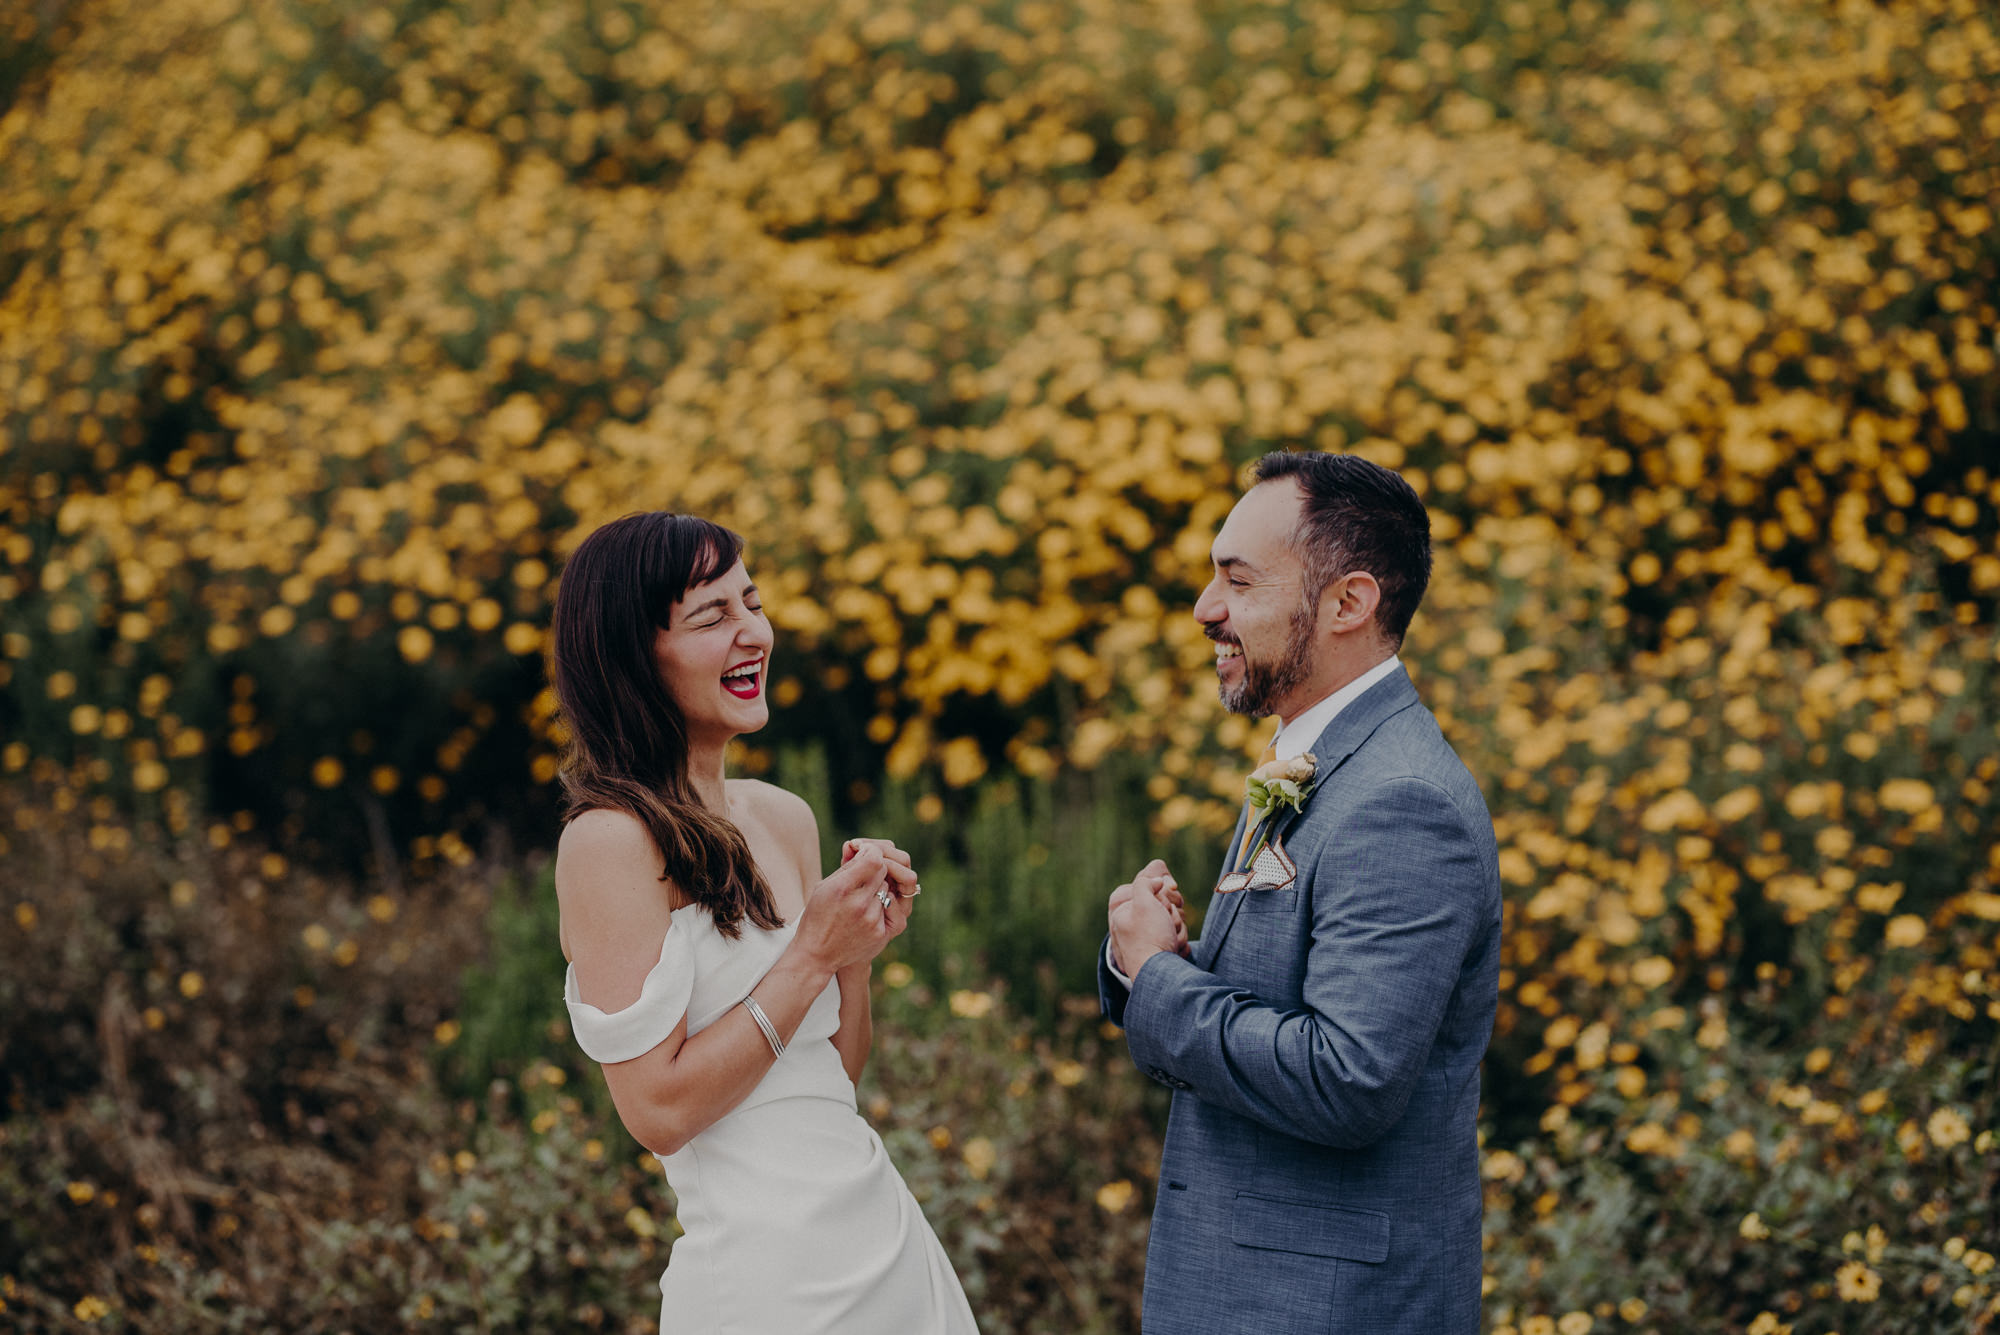 elopement photographer in los angeles - la wedding photographer - isaiahandtaylor.com-015.jpg